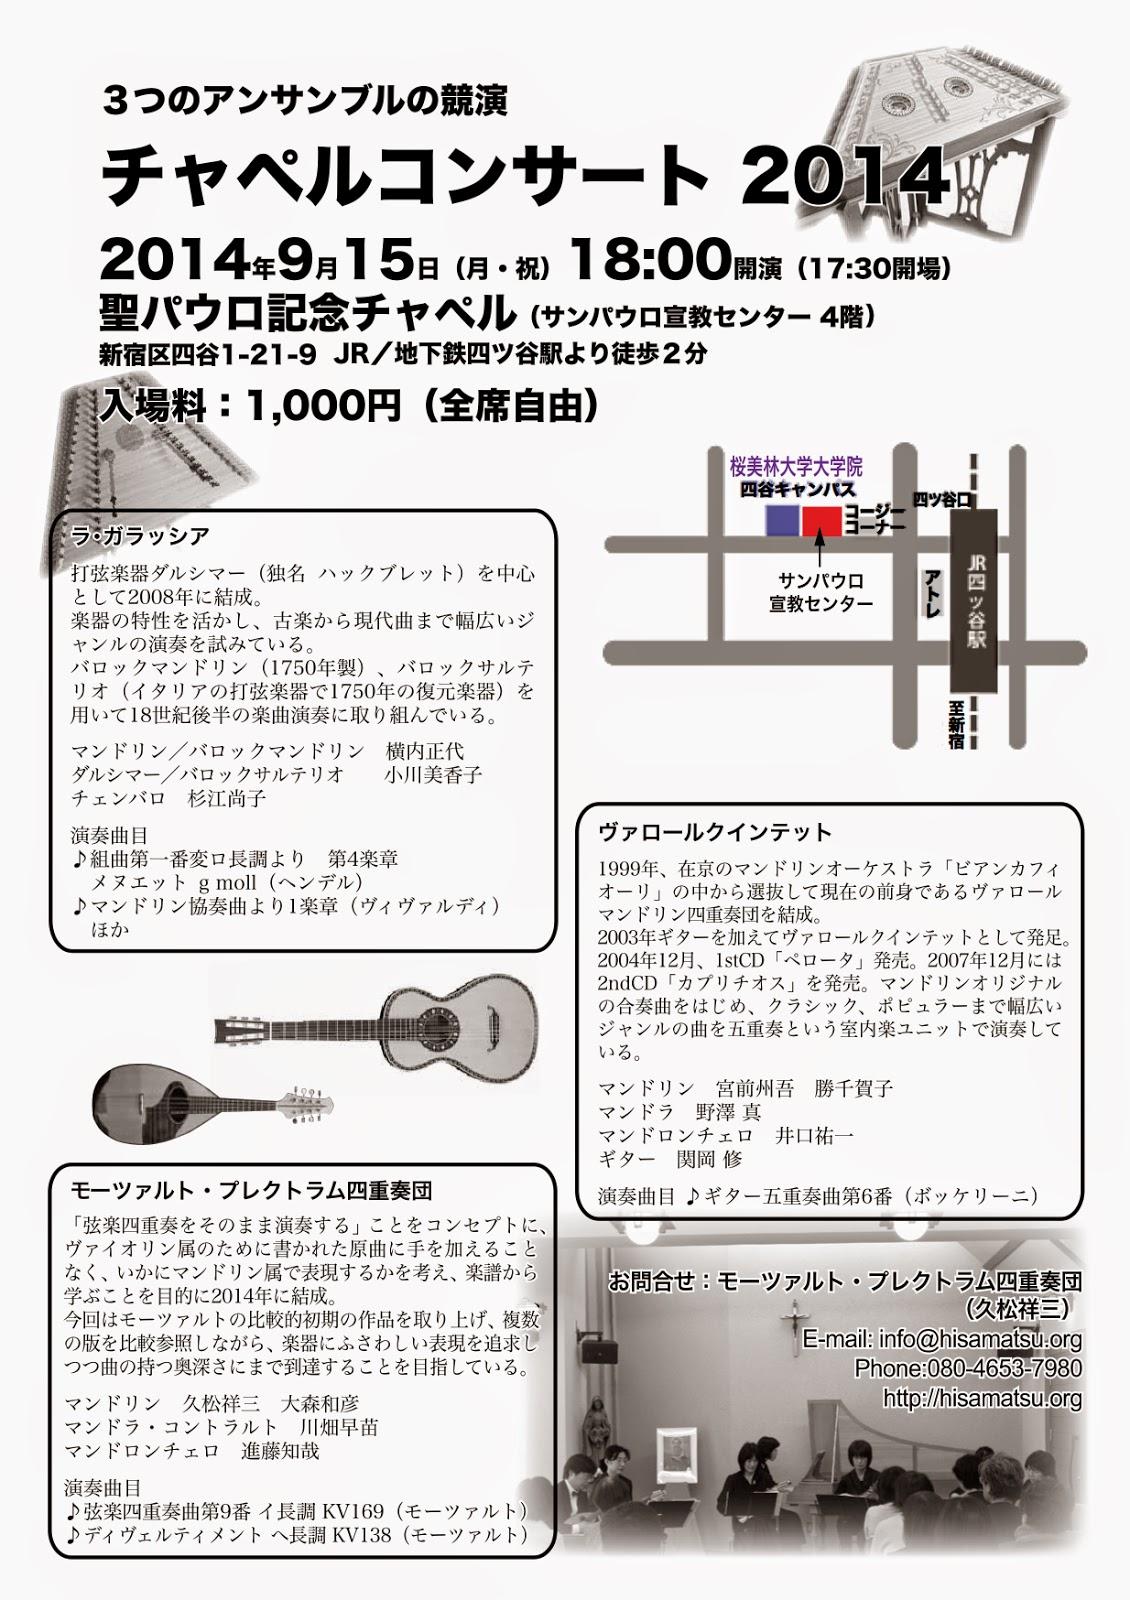 http://amadei.music.coocan.jp/download/2014Chapel_concert.pdf